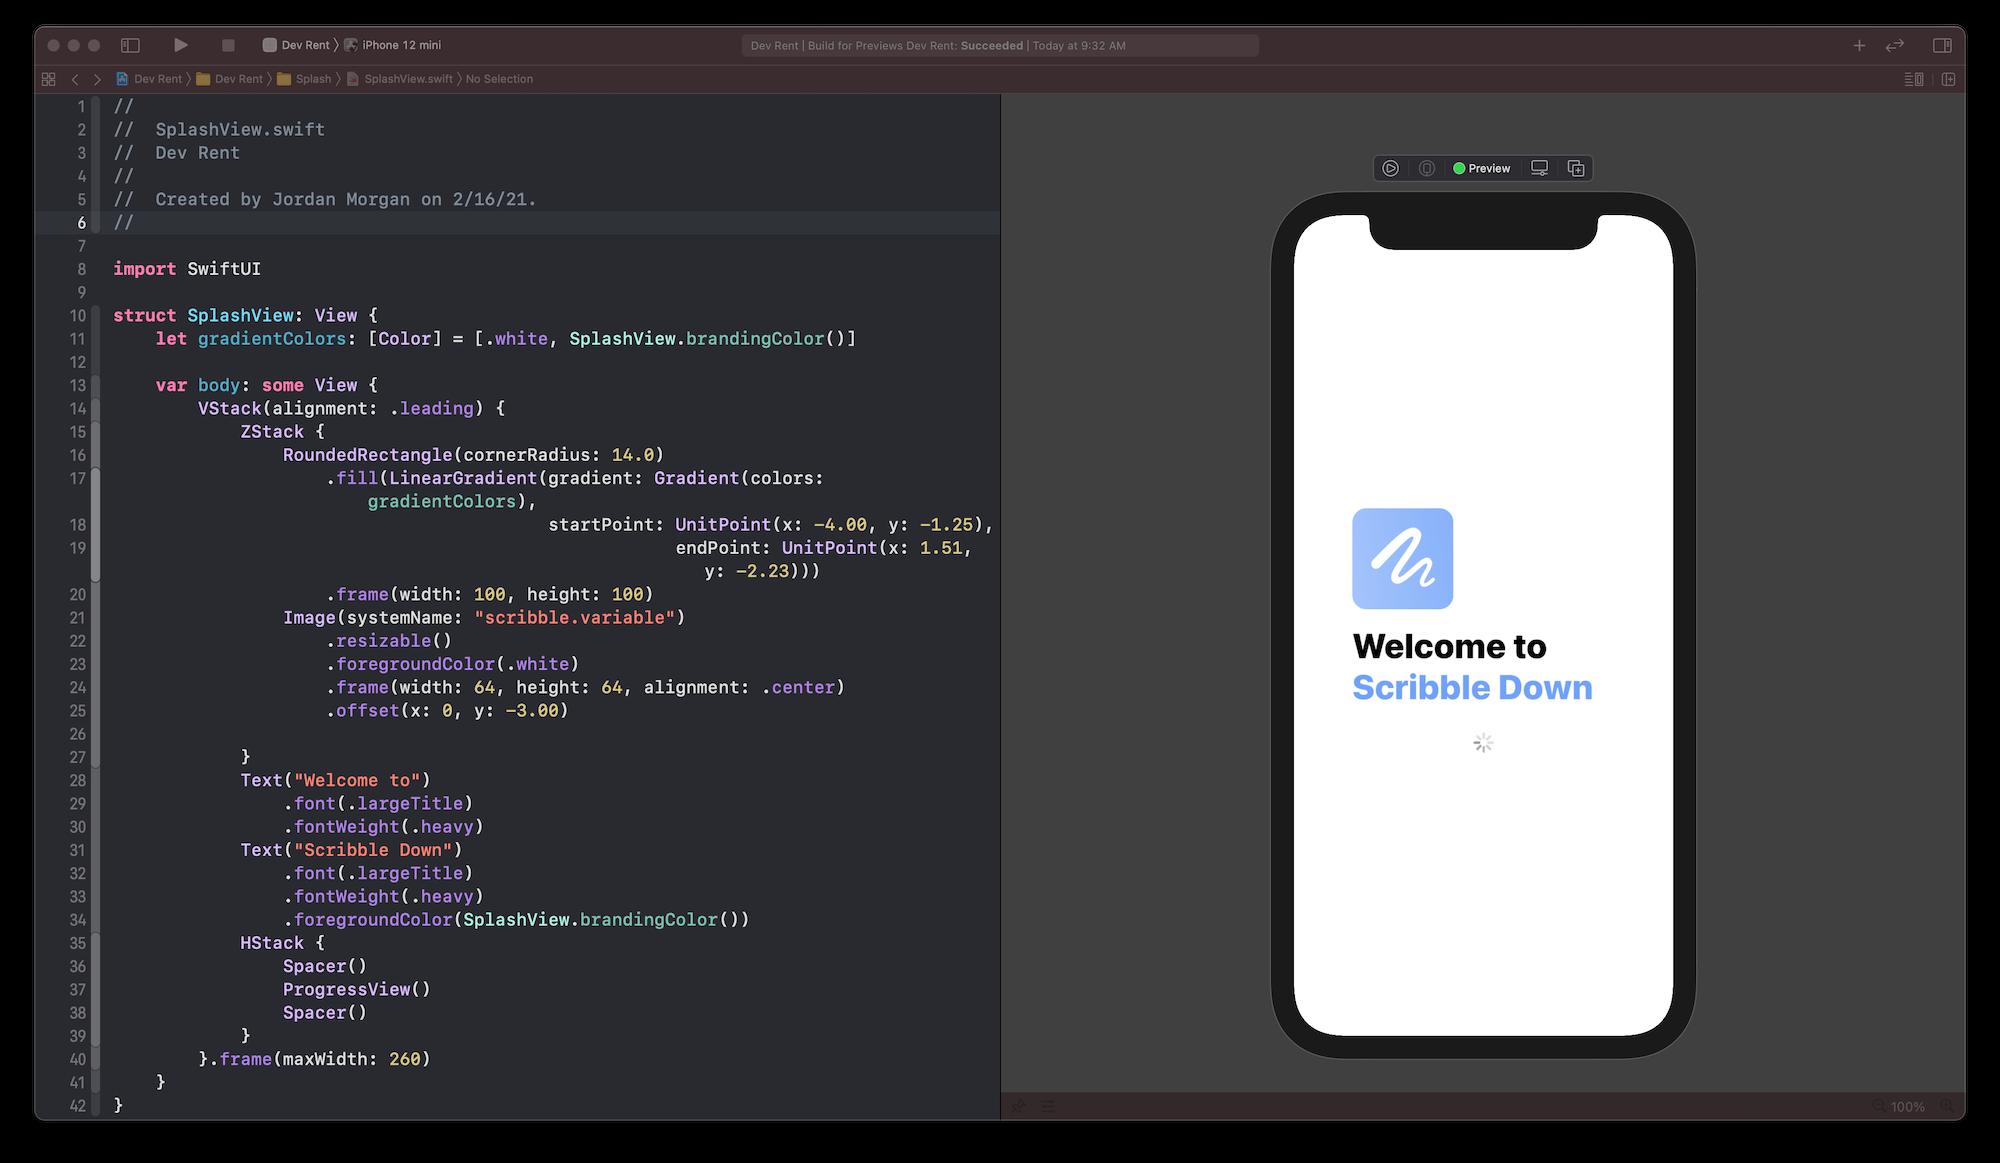 Xcode Screenshot